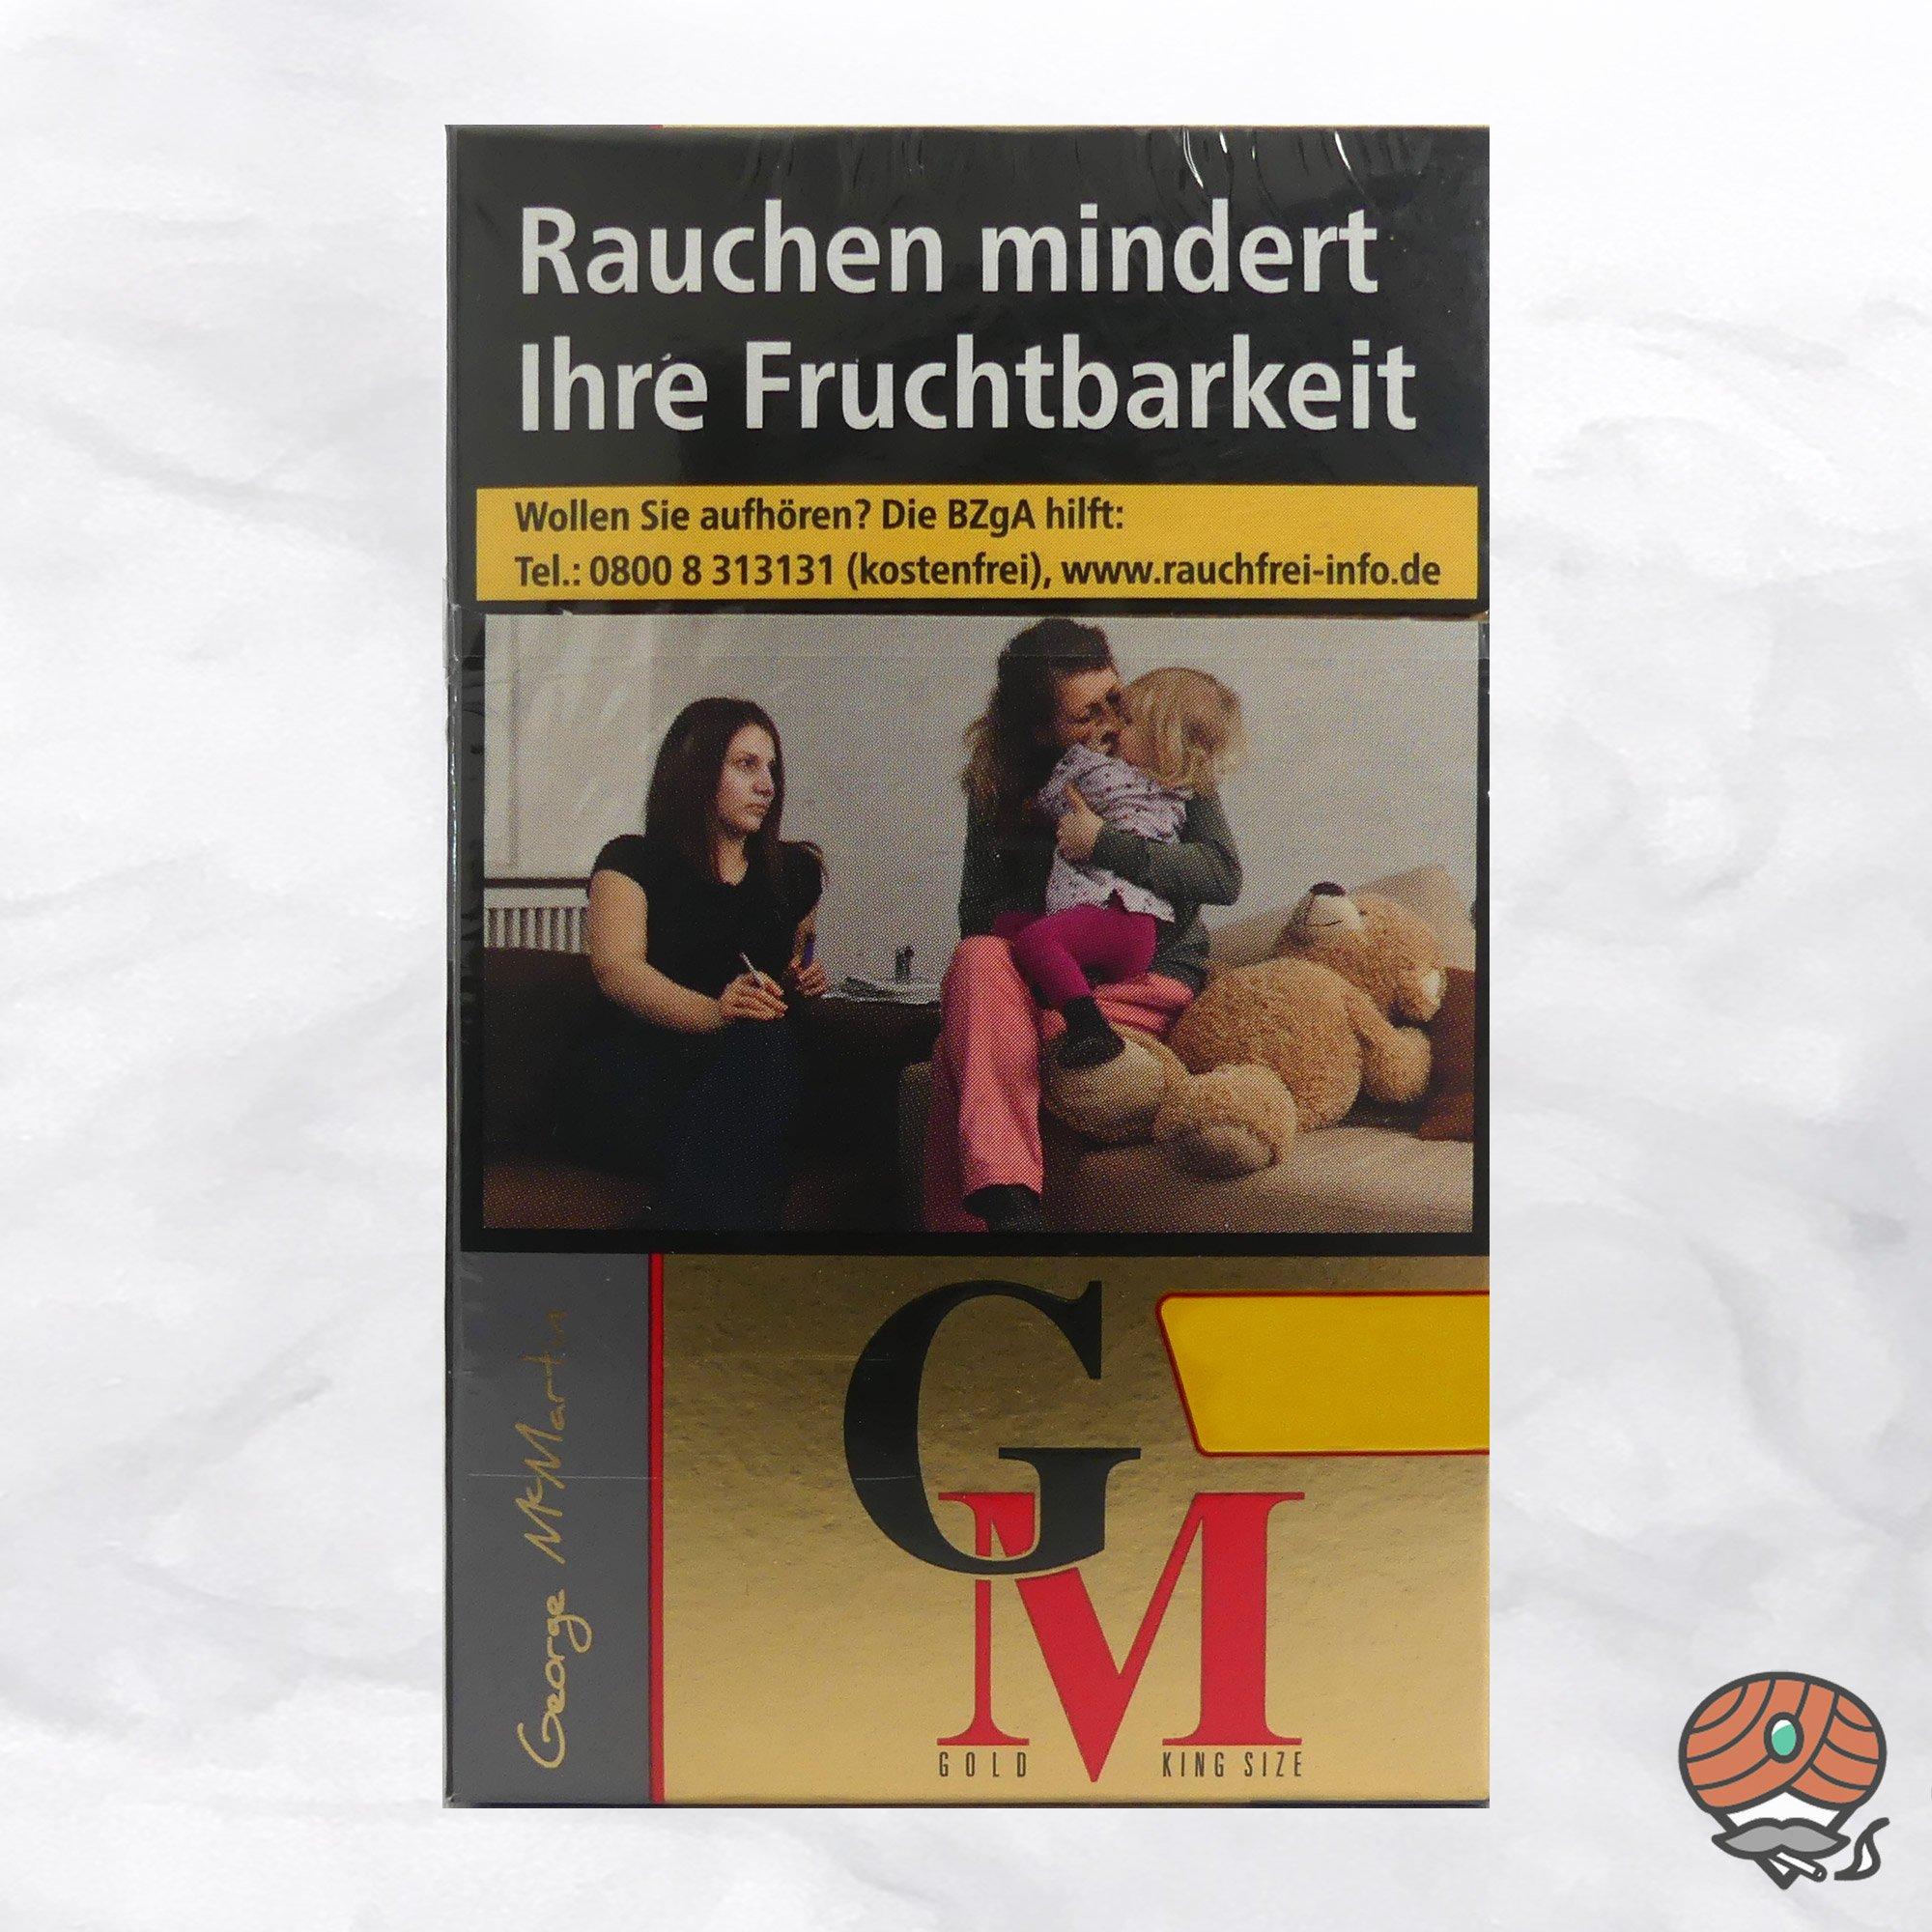 George Mc Martin (GM) Gold Filterzigaretten - 20 Zigaretten